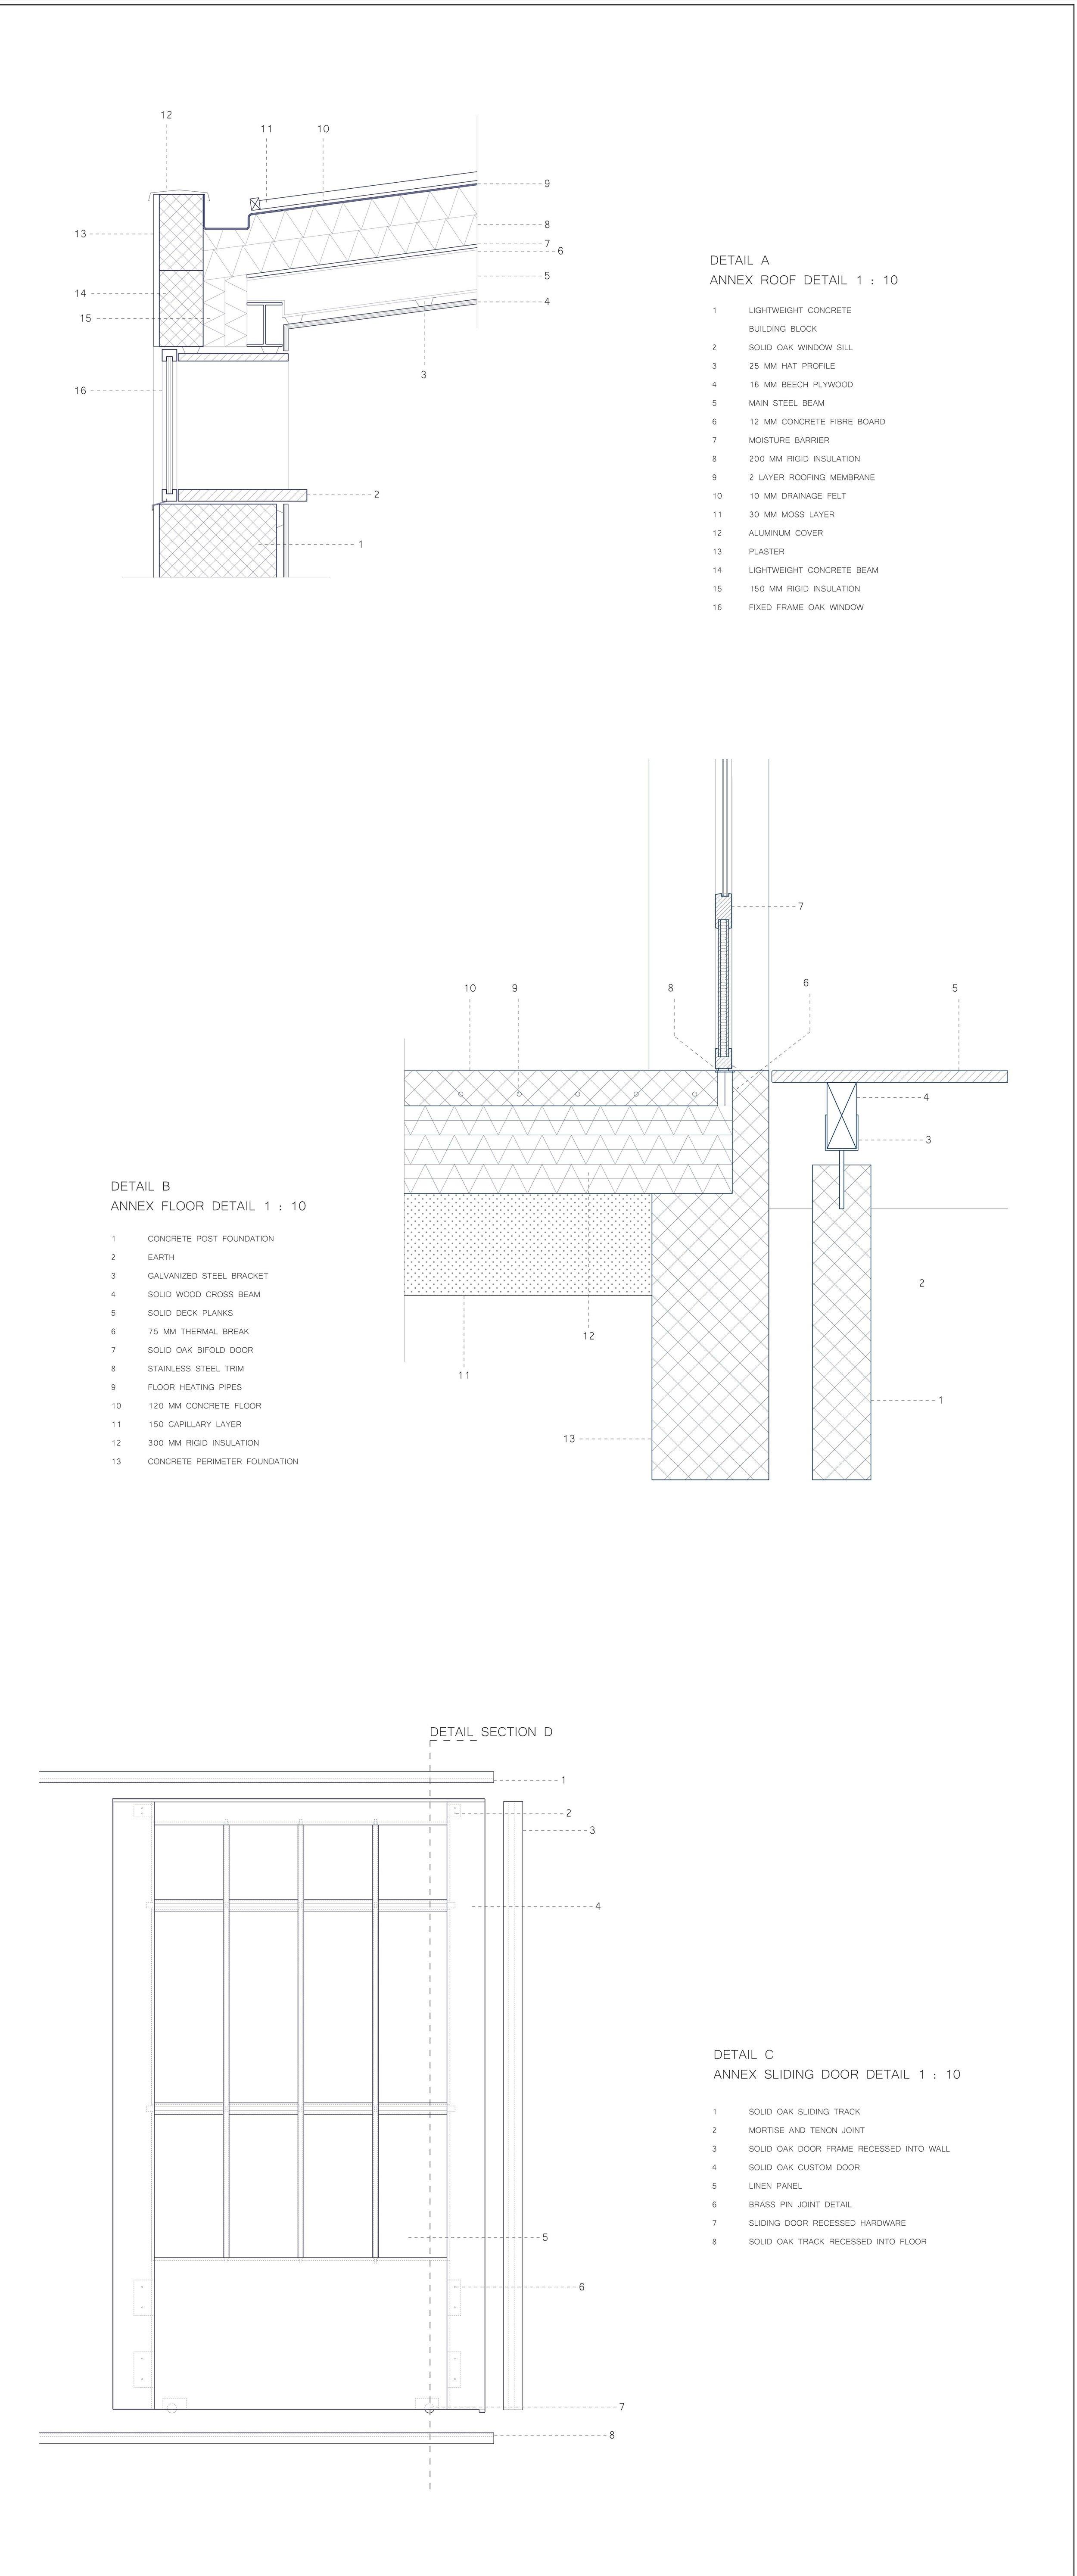 Røntofte Annex Detail Drawings, Megan Blake, 2017.